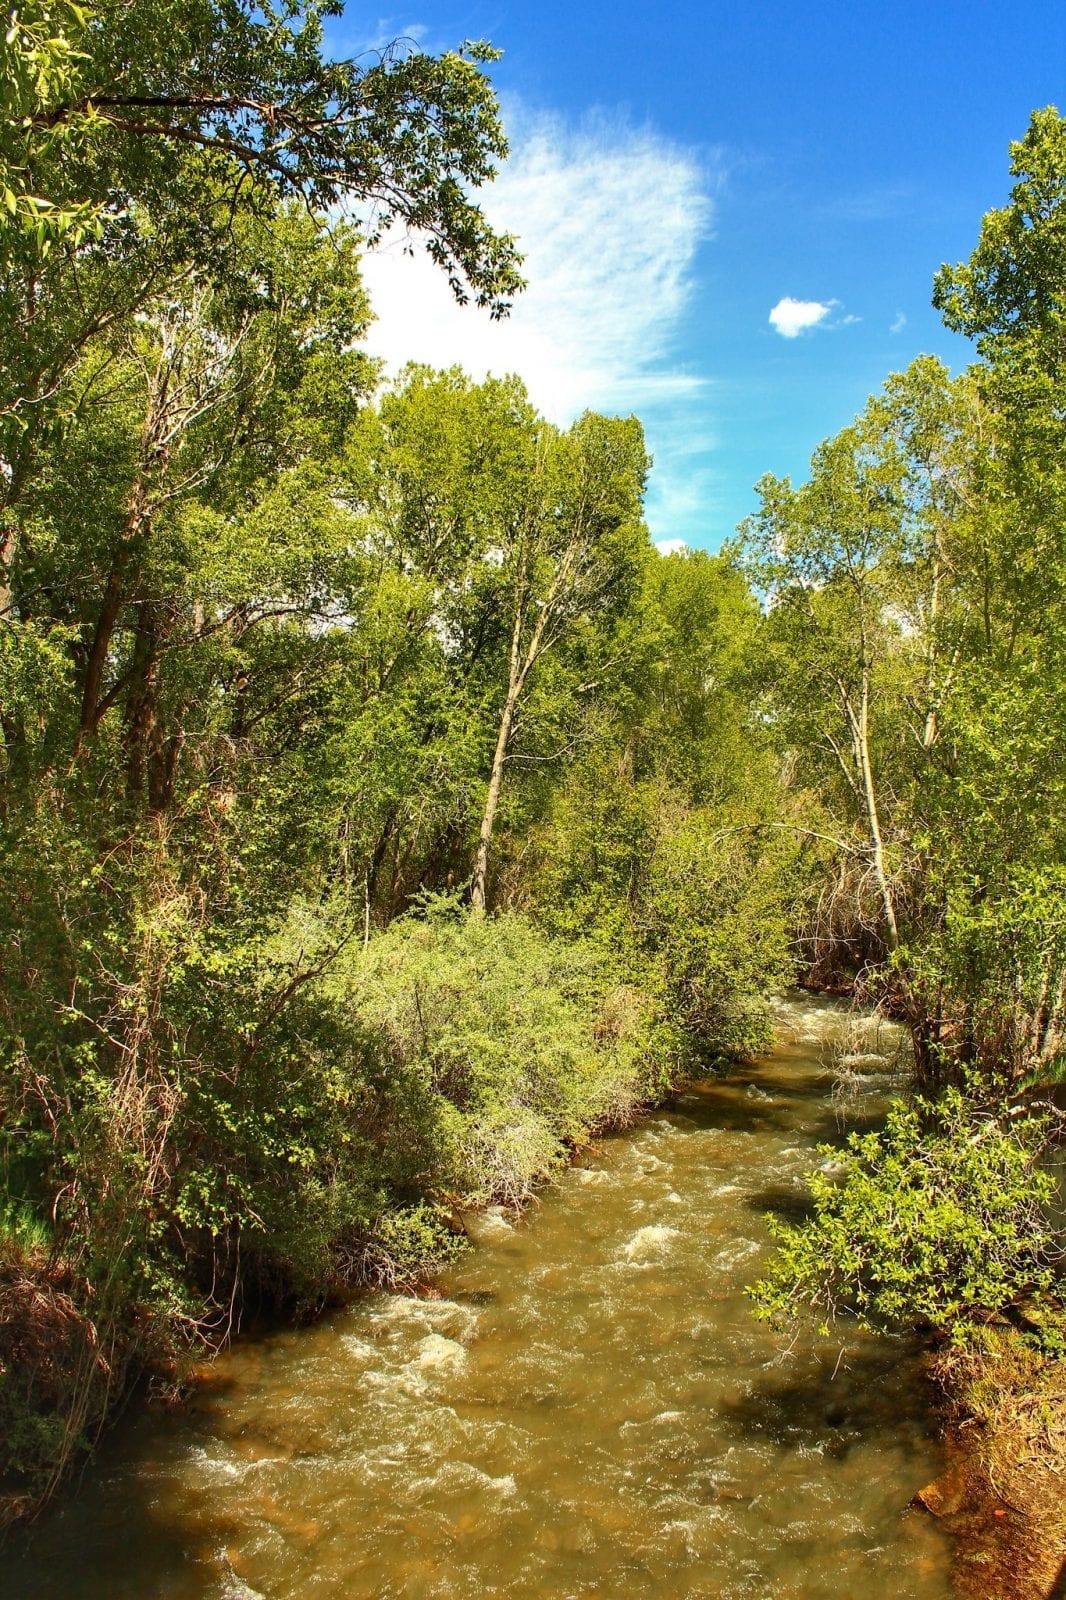 Image of the Mancos River in Colorado